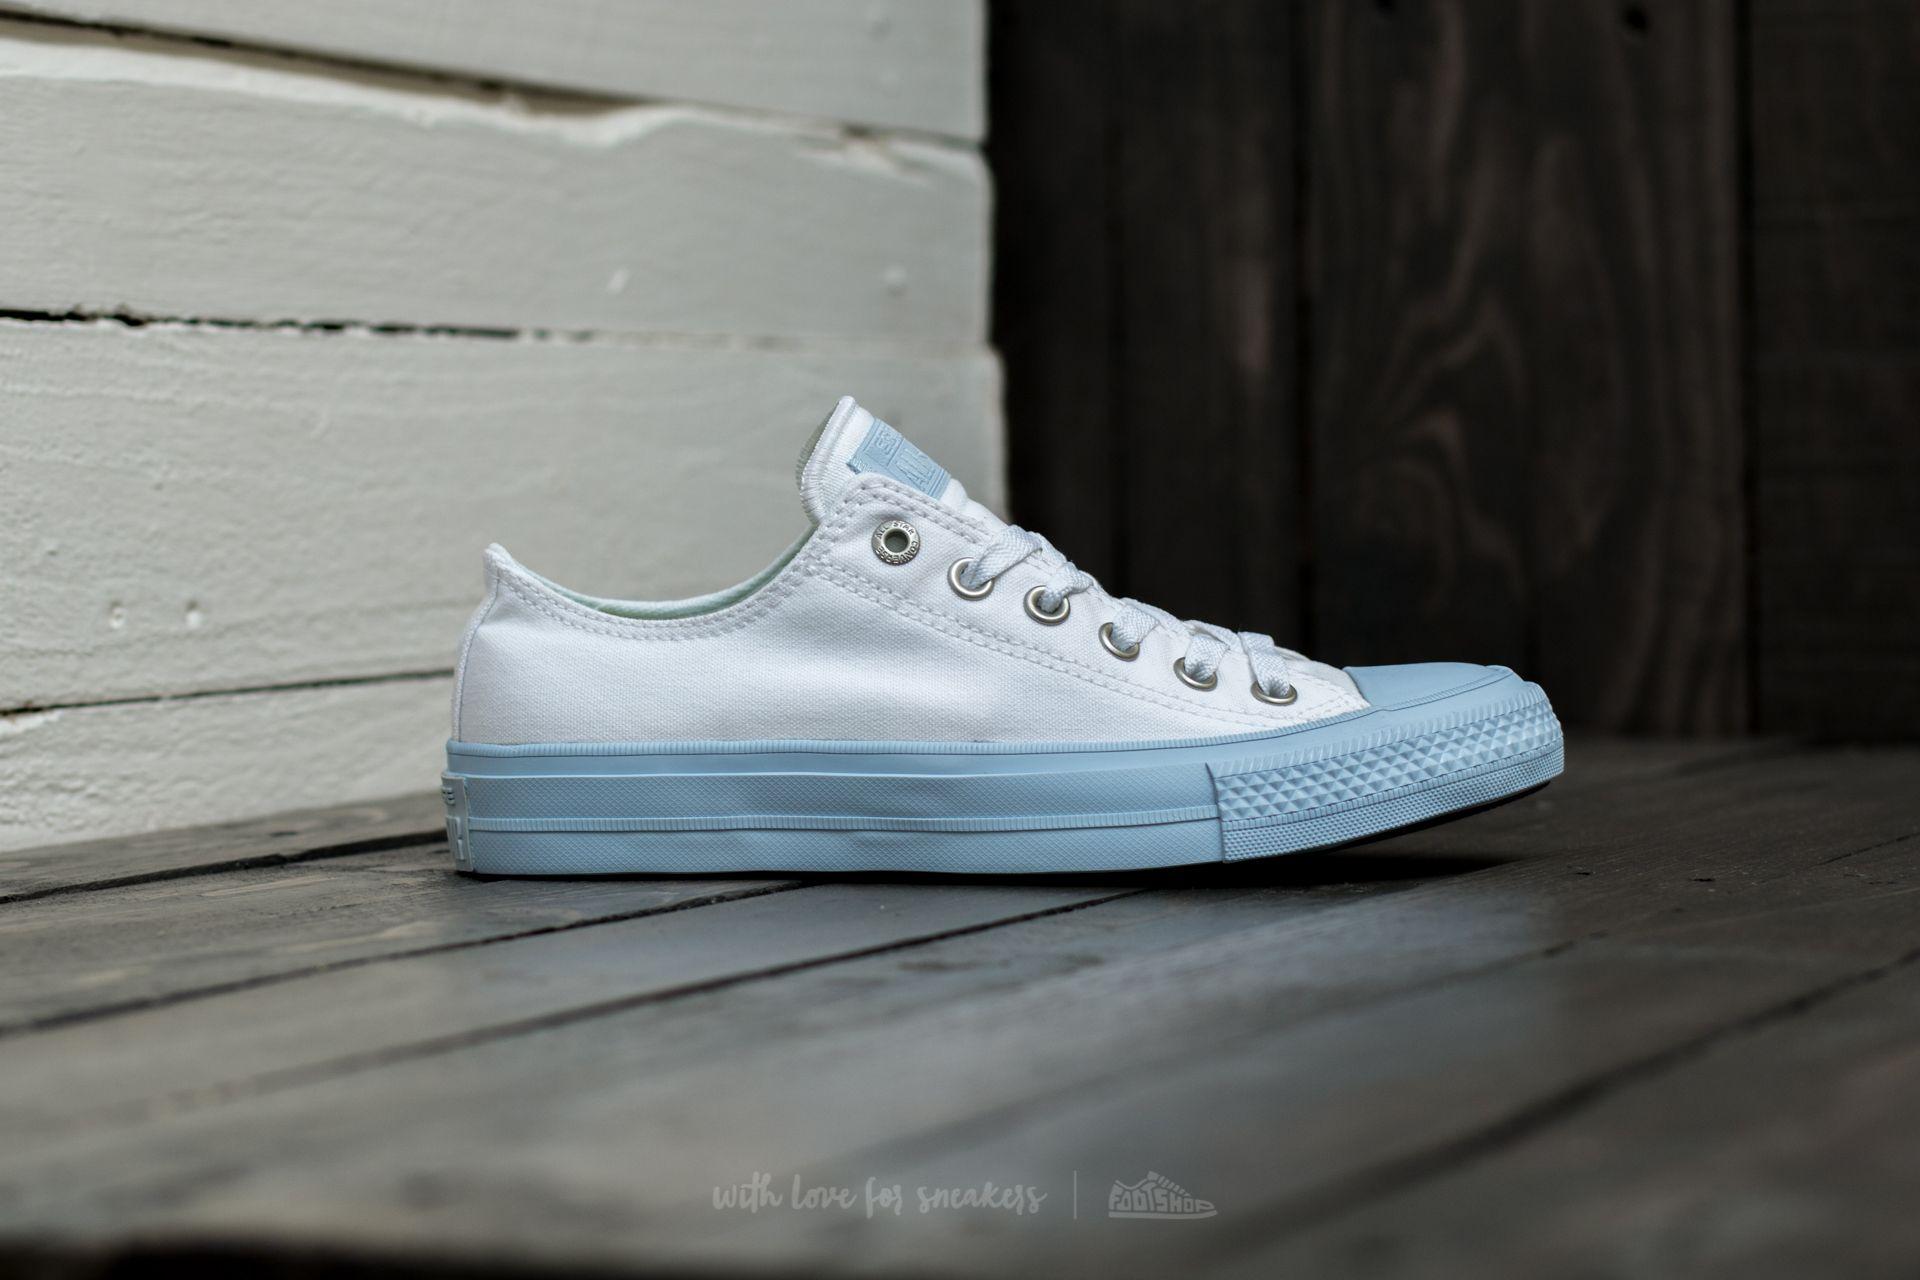 Star Converse Ii White Porpoise All Chuck Ox Taylor PXn0Ow8k